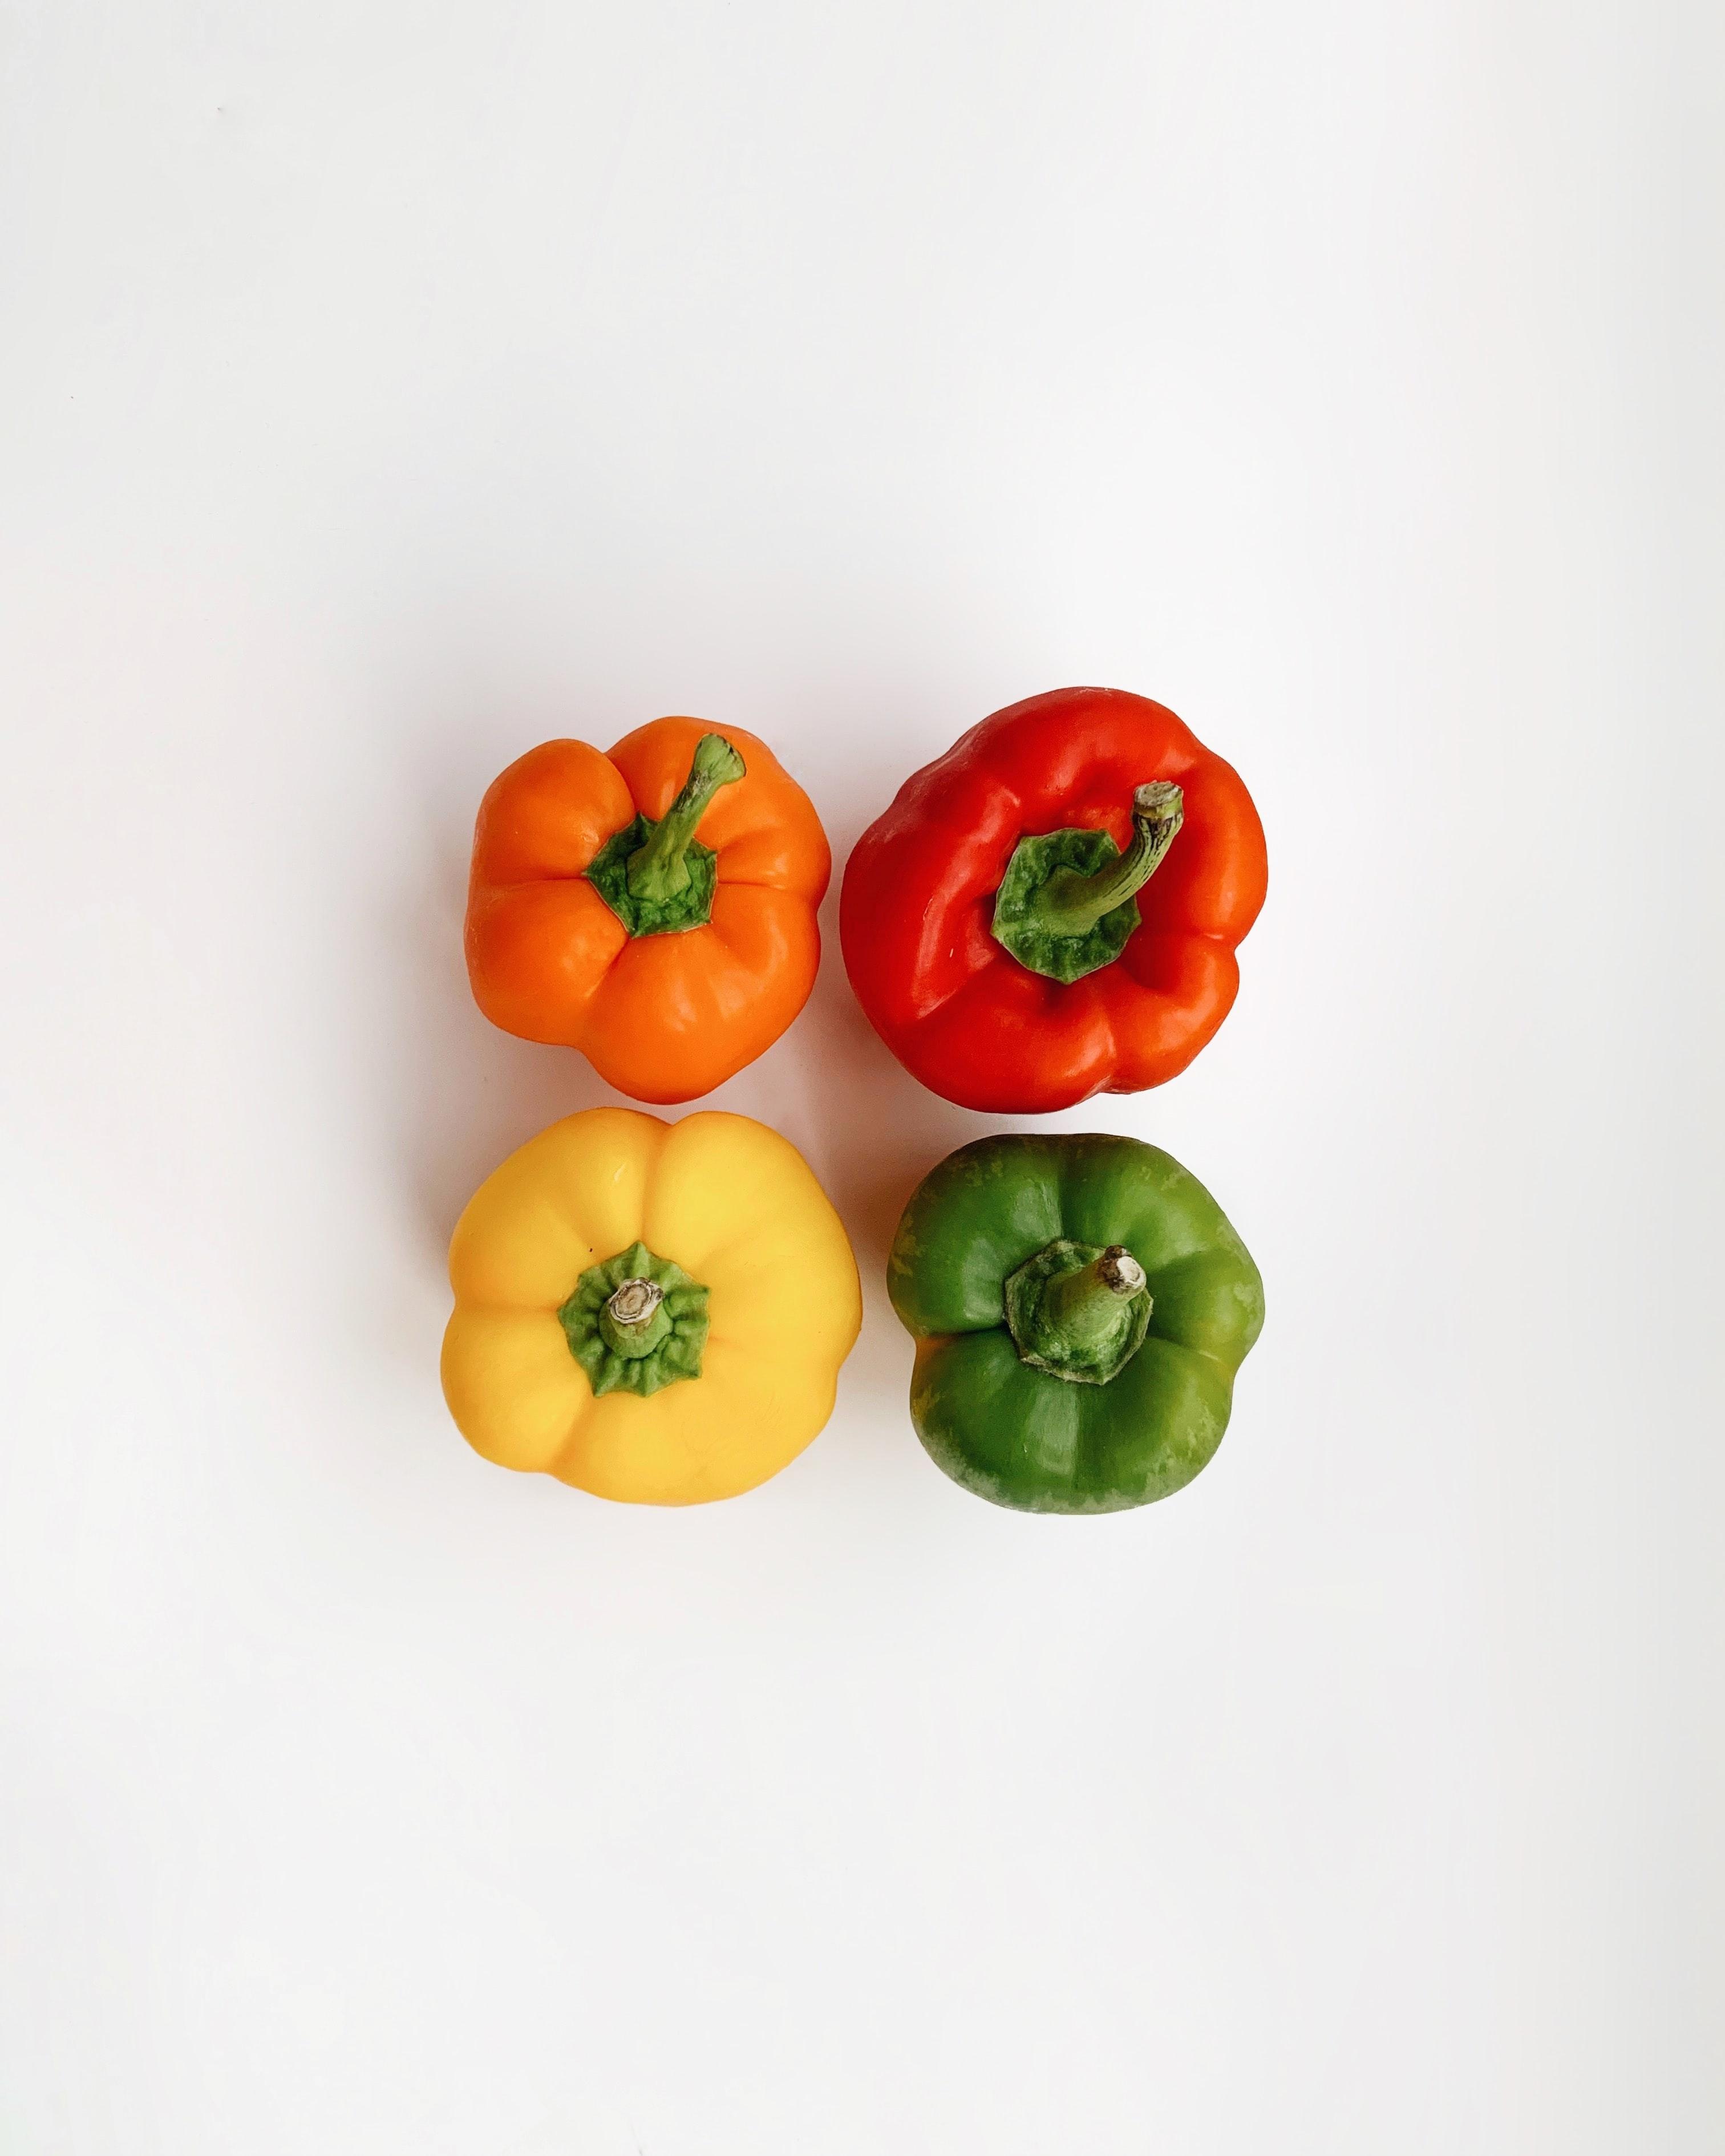 Peppers/irene-kredenets-0PUoXmsCSDQ-unsplash.jpg